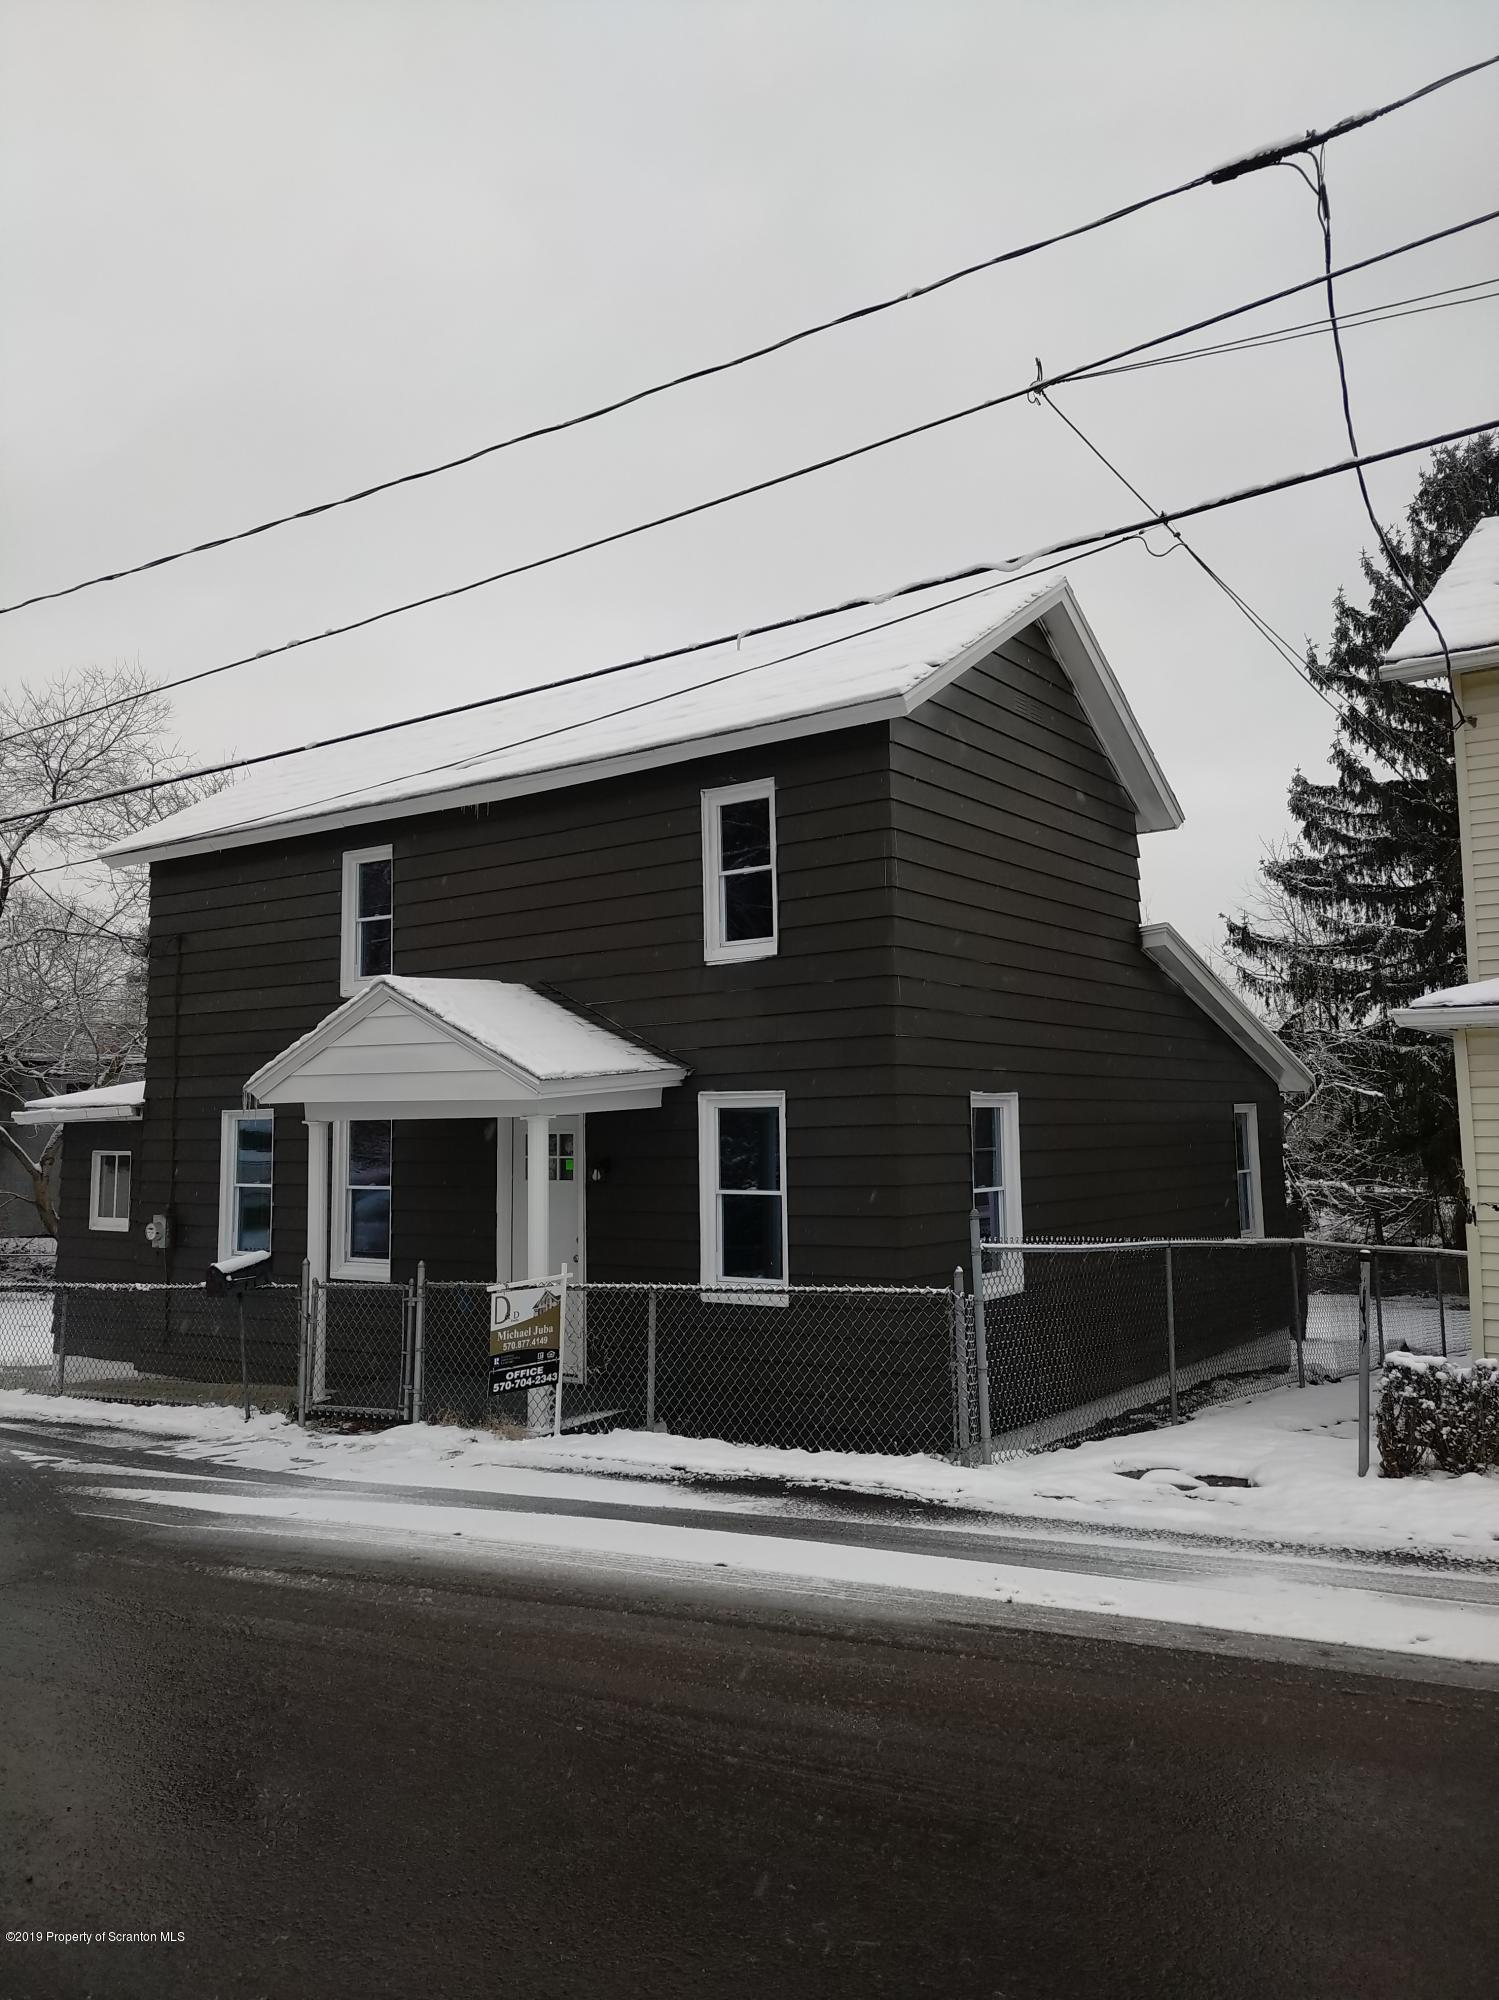 118 Casper St, Old Forge, Pennsylvania 18518, 3 Bedrooms Bedrooms, 5 Rooms Rooms,1 BathroomBathrooms,Single Family,For Sale,Casper,19-5597